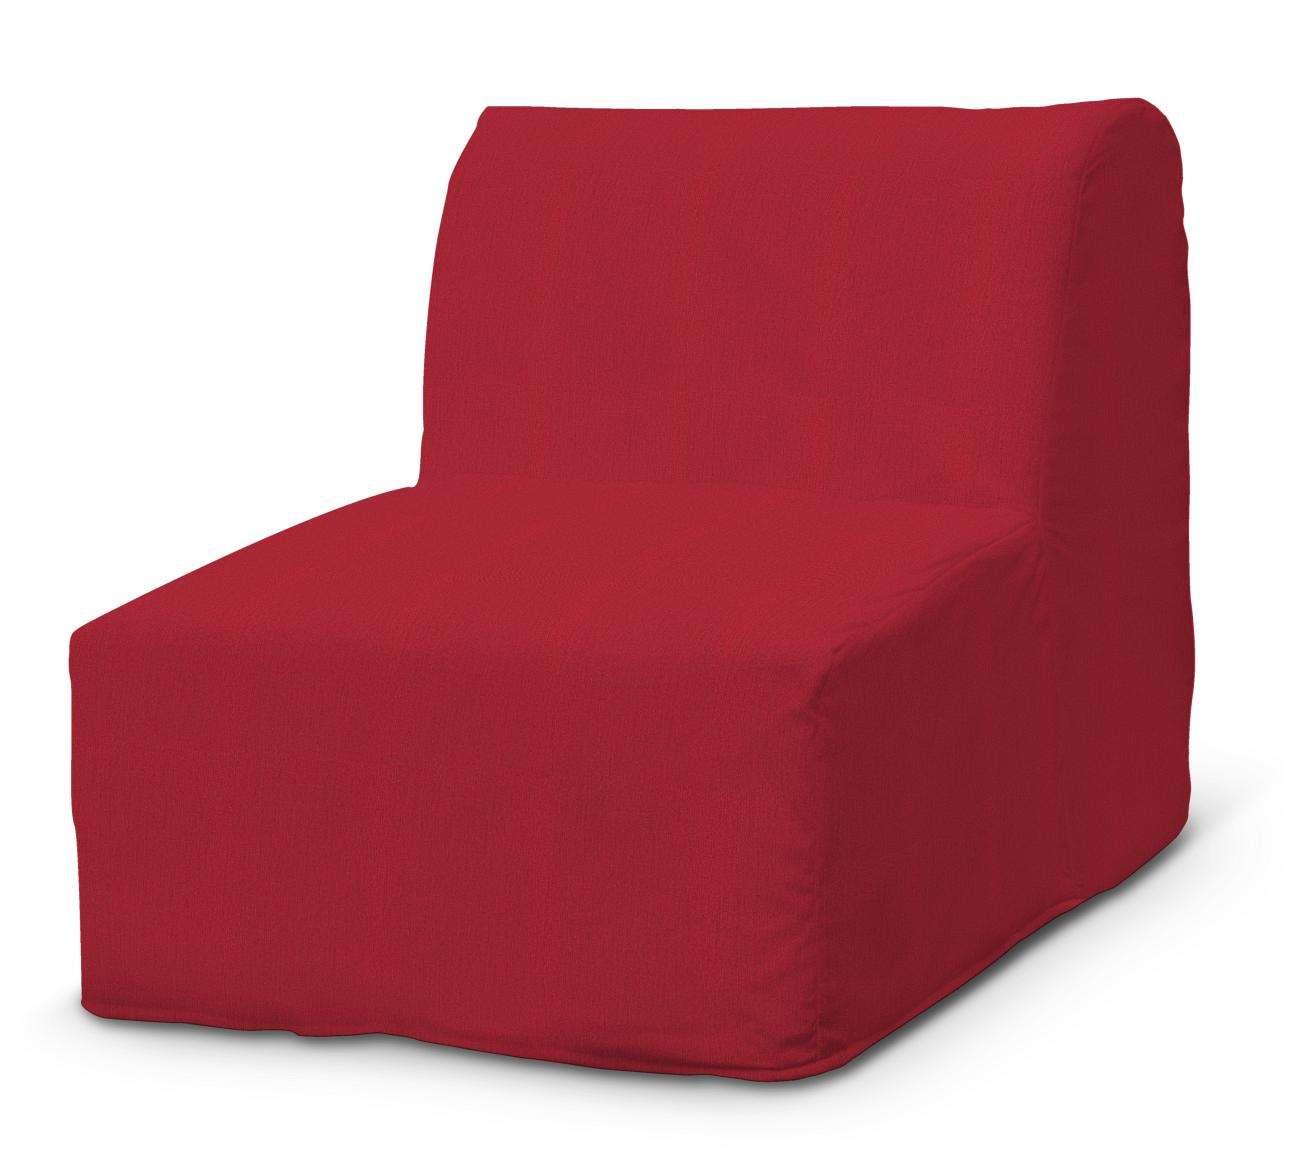 Pokrowiec na fotel Lycksele prosty fotel Lycksele w kolekcji Chenille, tkanina: 702-24